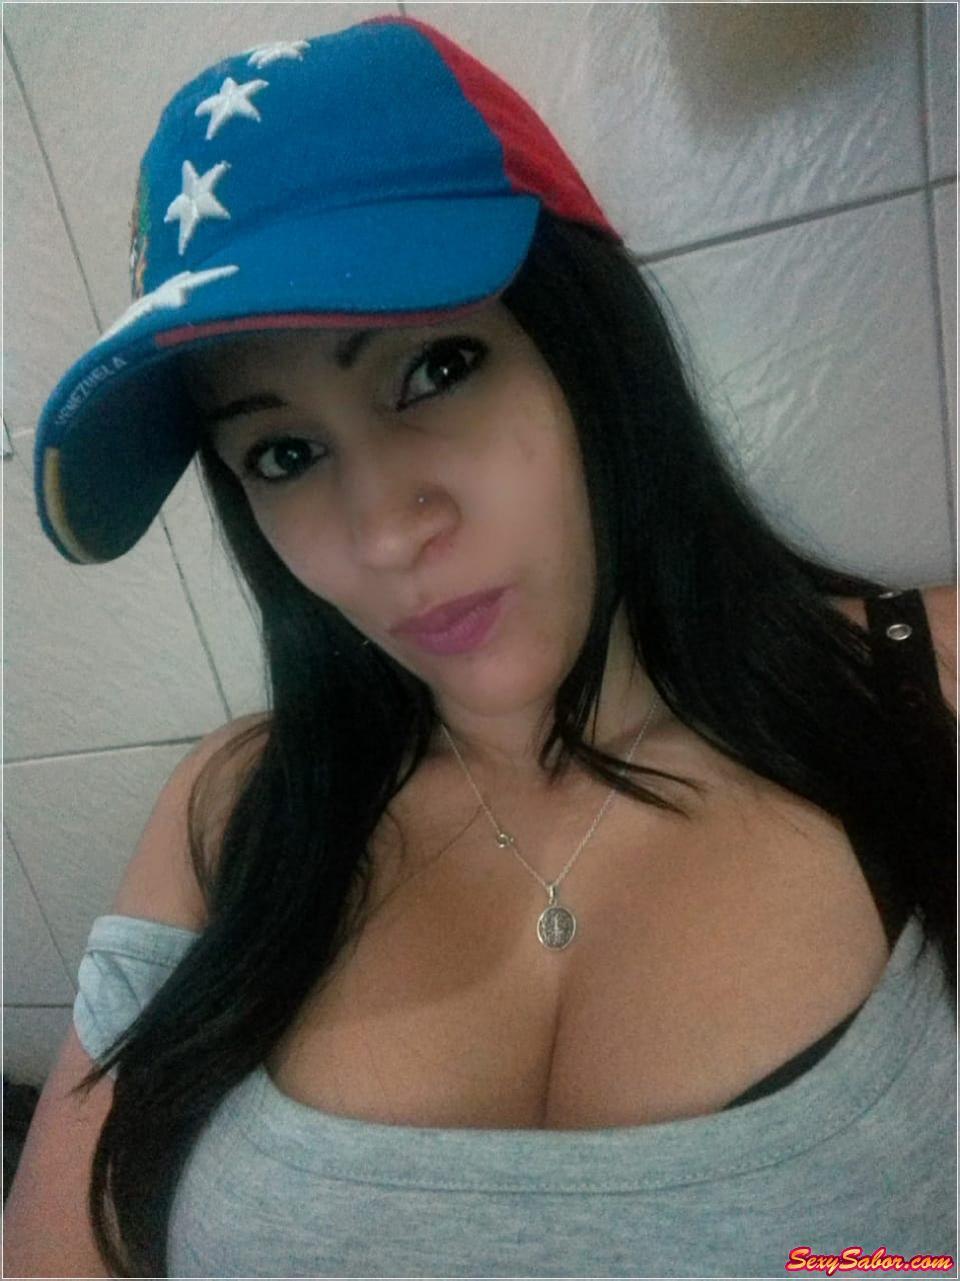 Cataleya 15-3480-4056